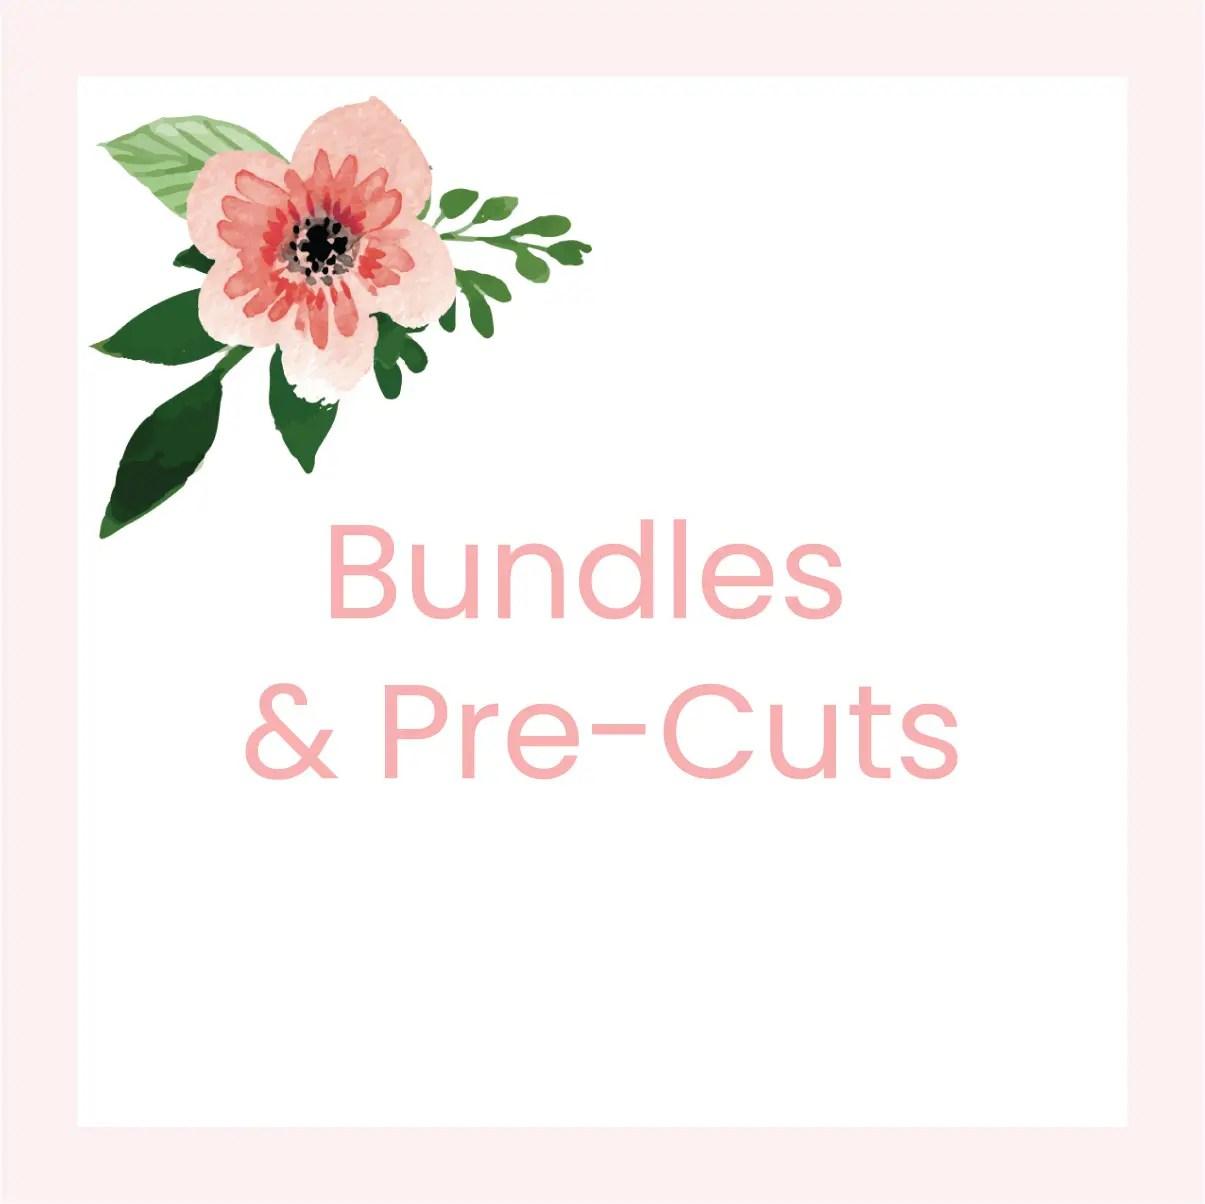 Bundles & Pre-cuts